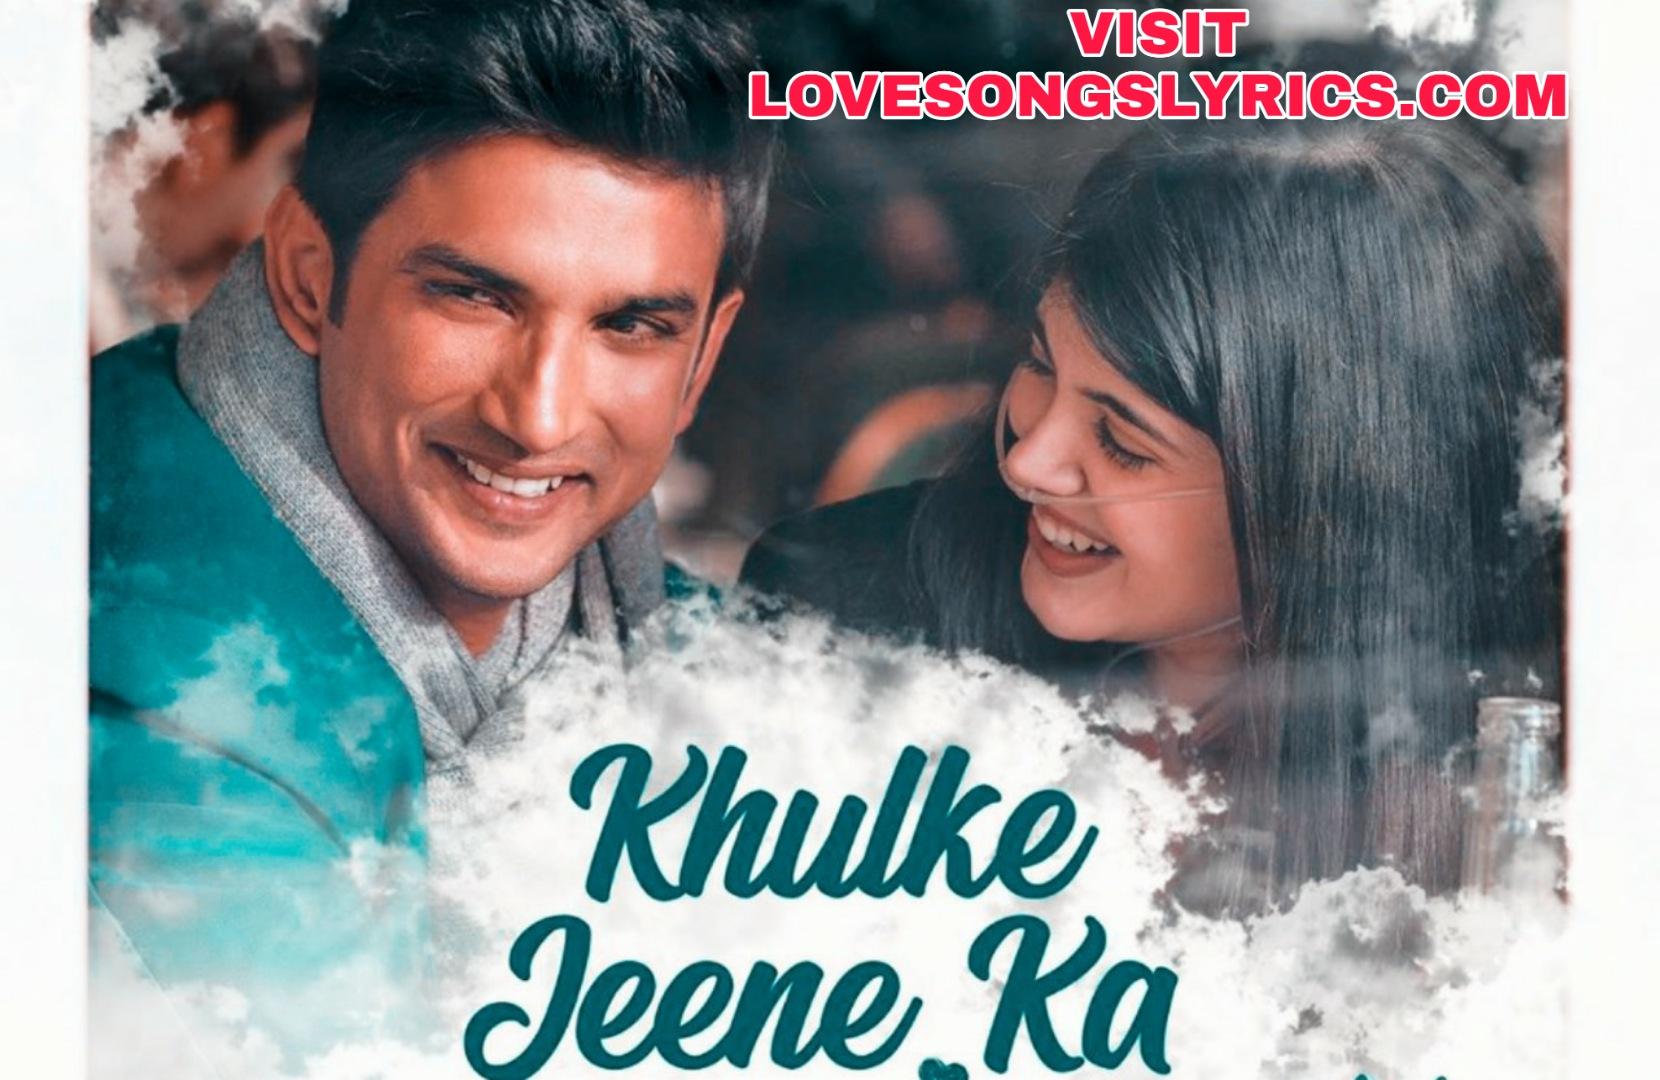 Khulke Jeene ka tarika Lyrics in Hindi